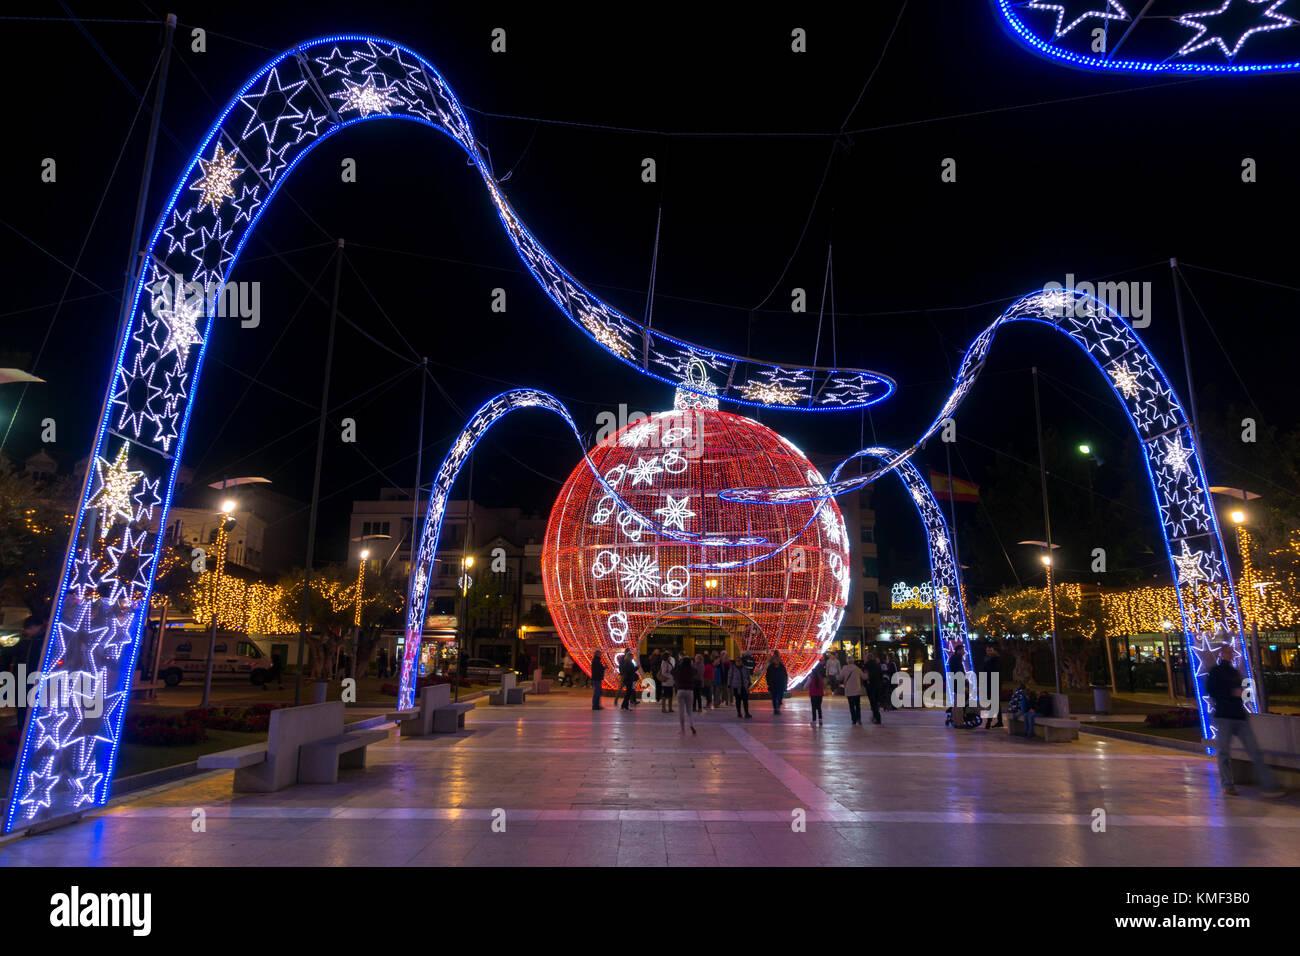 Giant Christmas Ball Christmas Bauble Christmas Lights In Center